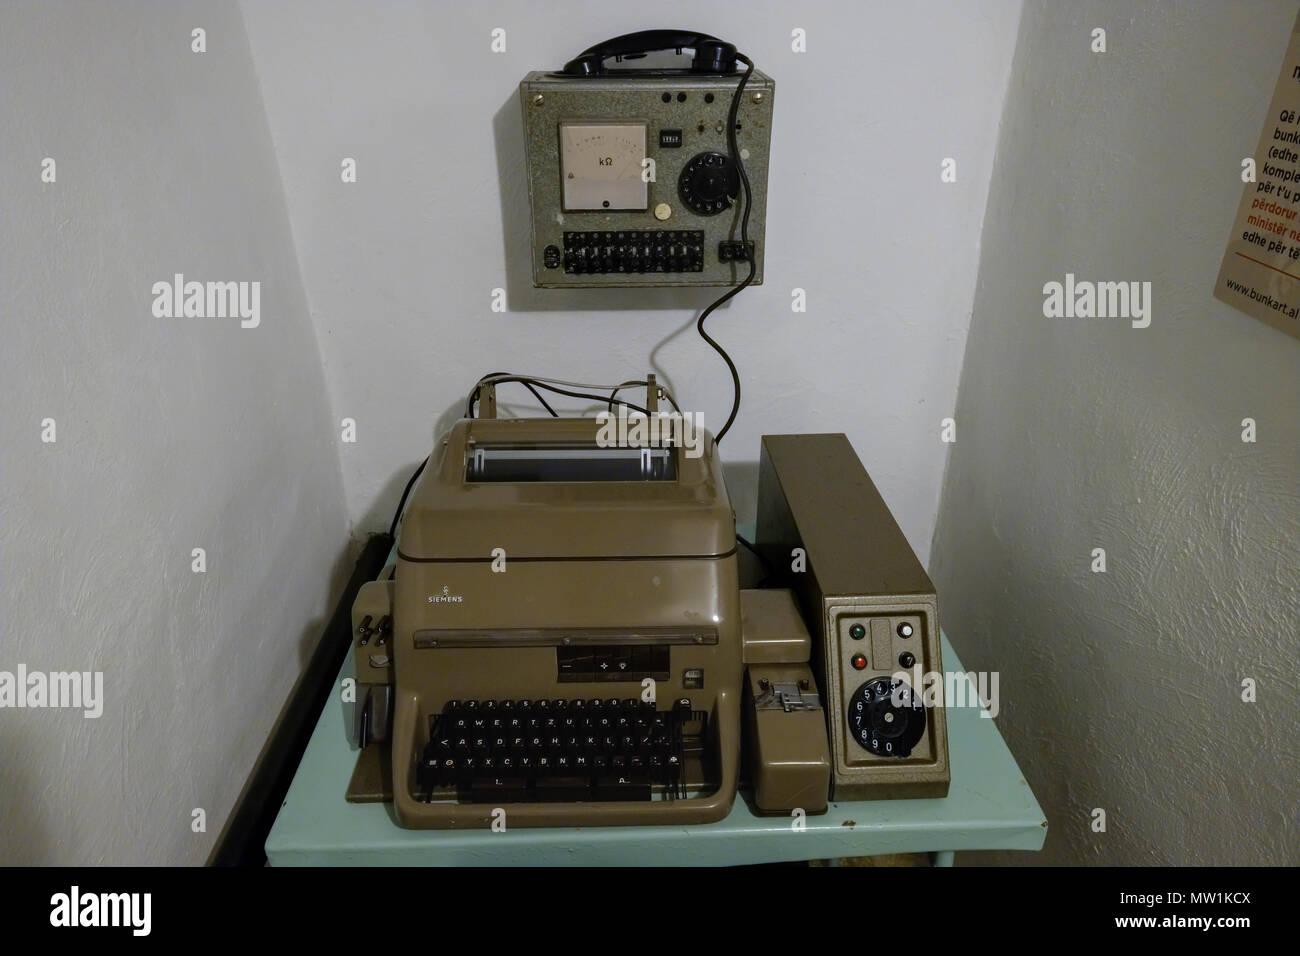 Telecommunications equipment, Museum Bunk'Art 2, former nuclear bunker, city center, Tirana, Albania - Stock Image